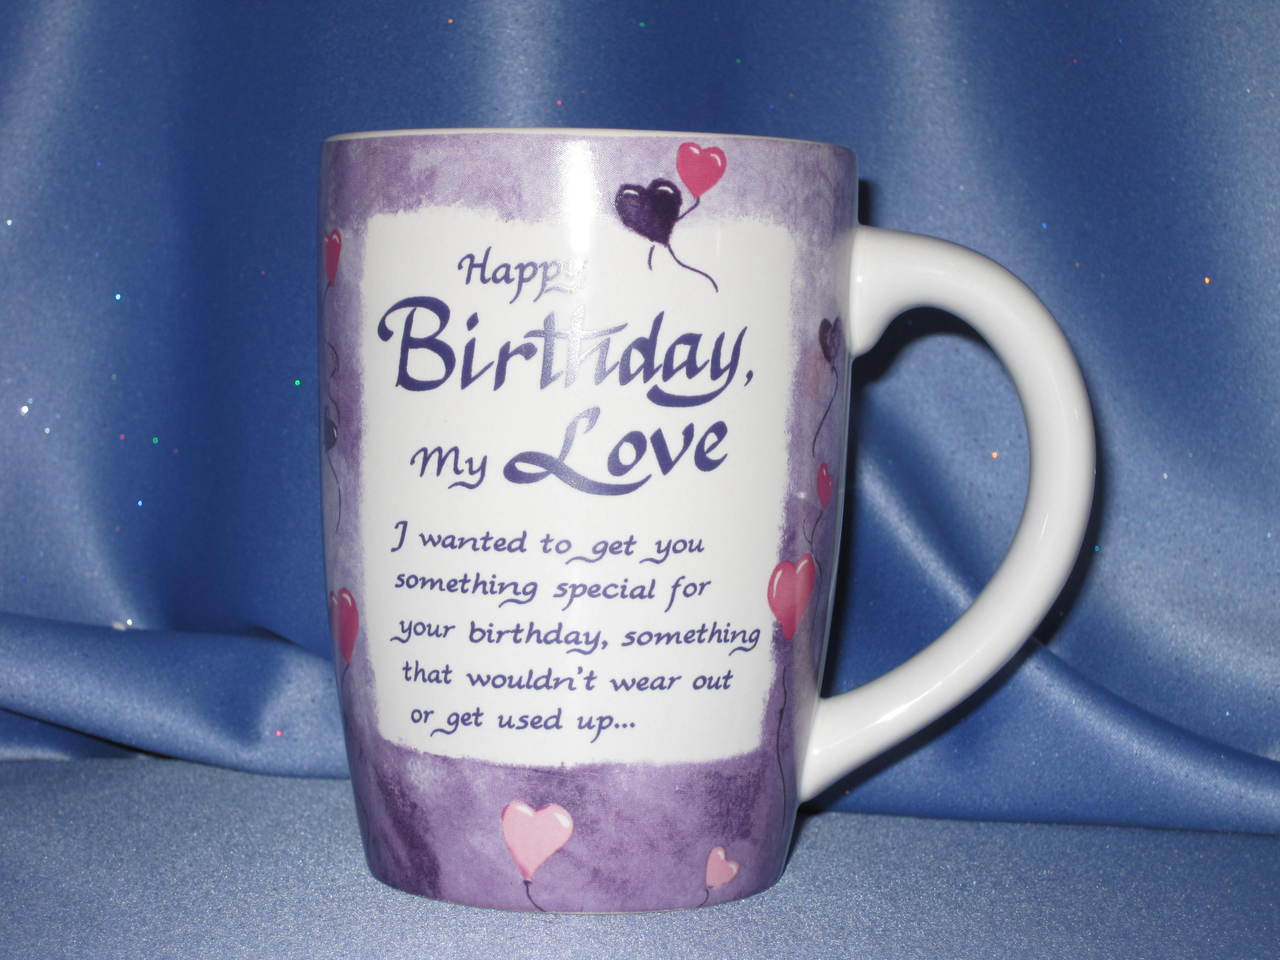 Happy Birthday My Love Mug.